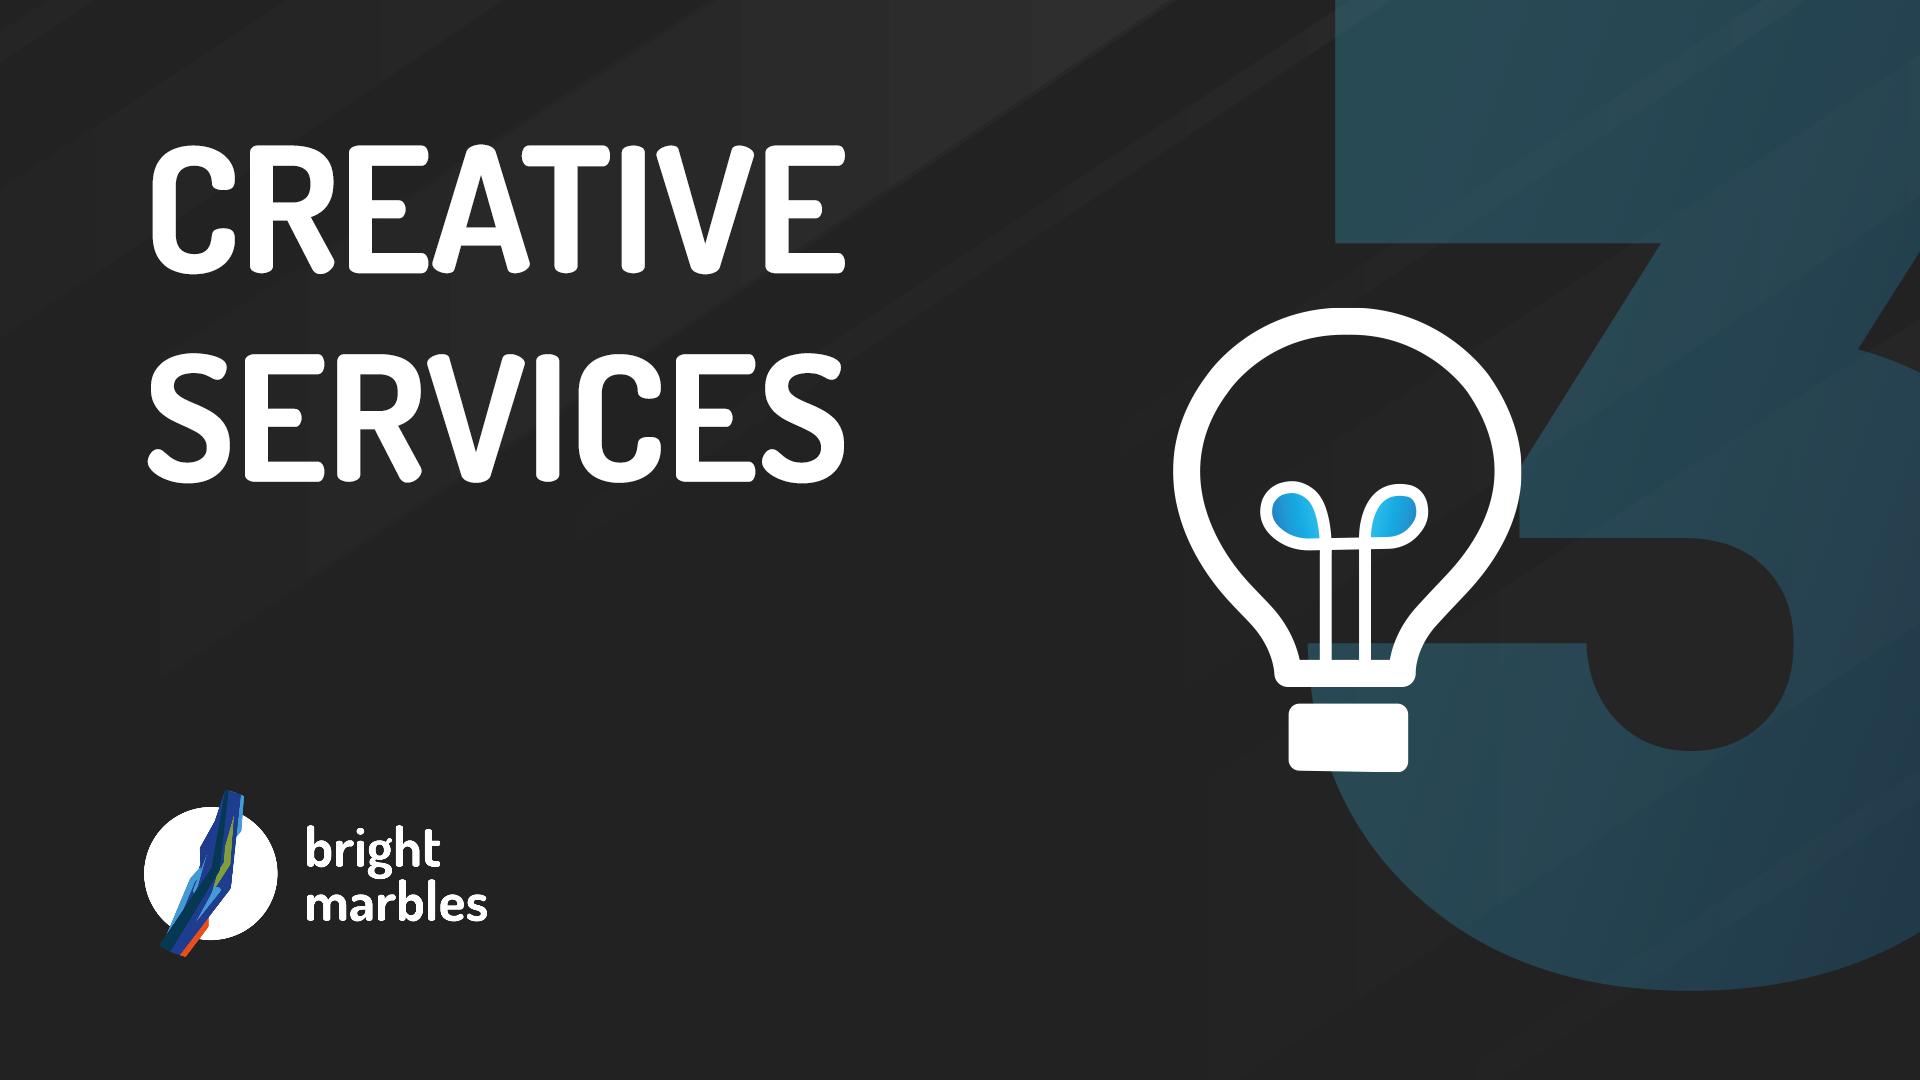 Creative services icon